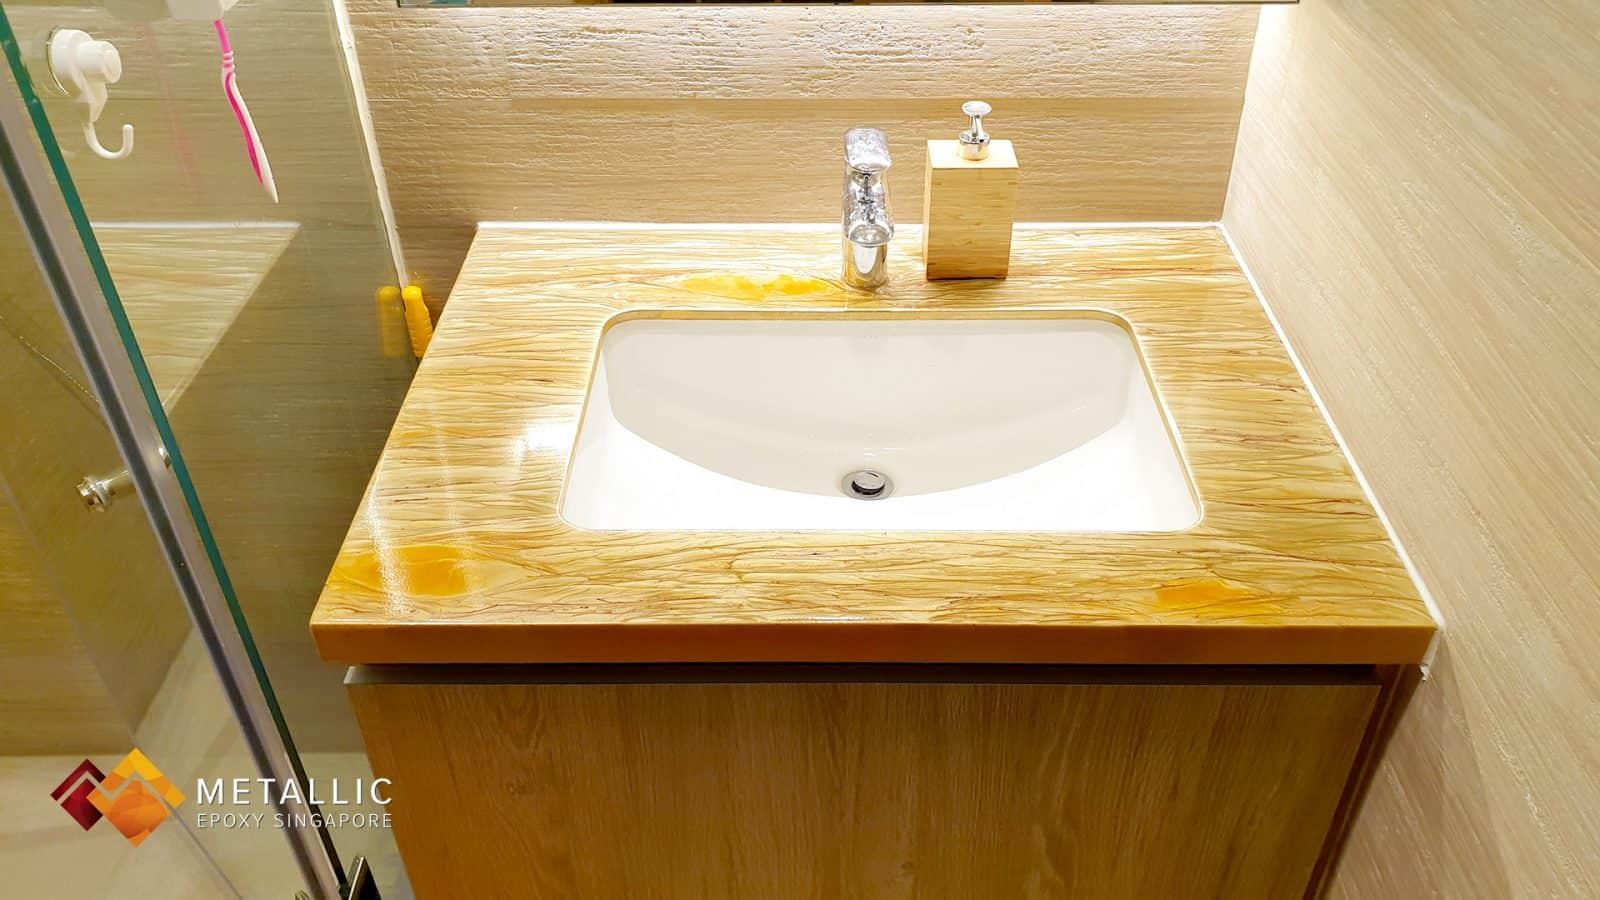 Gold on Khaki Wood Theme Vanity Top